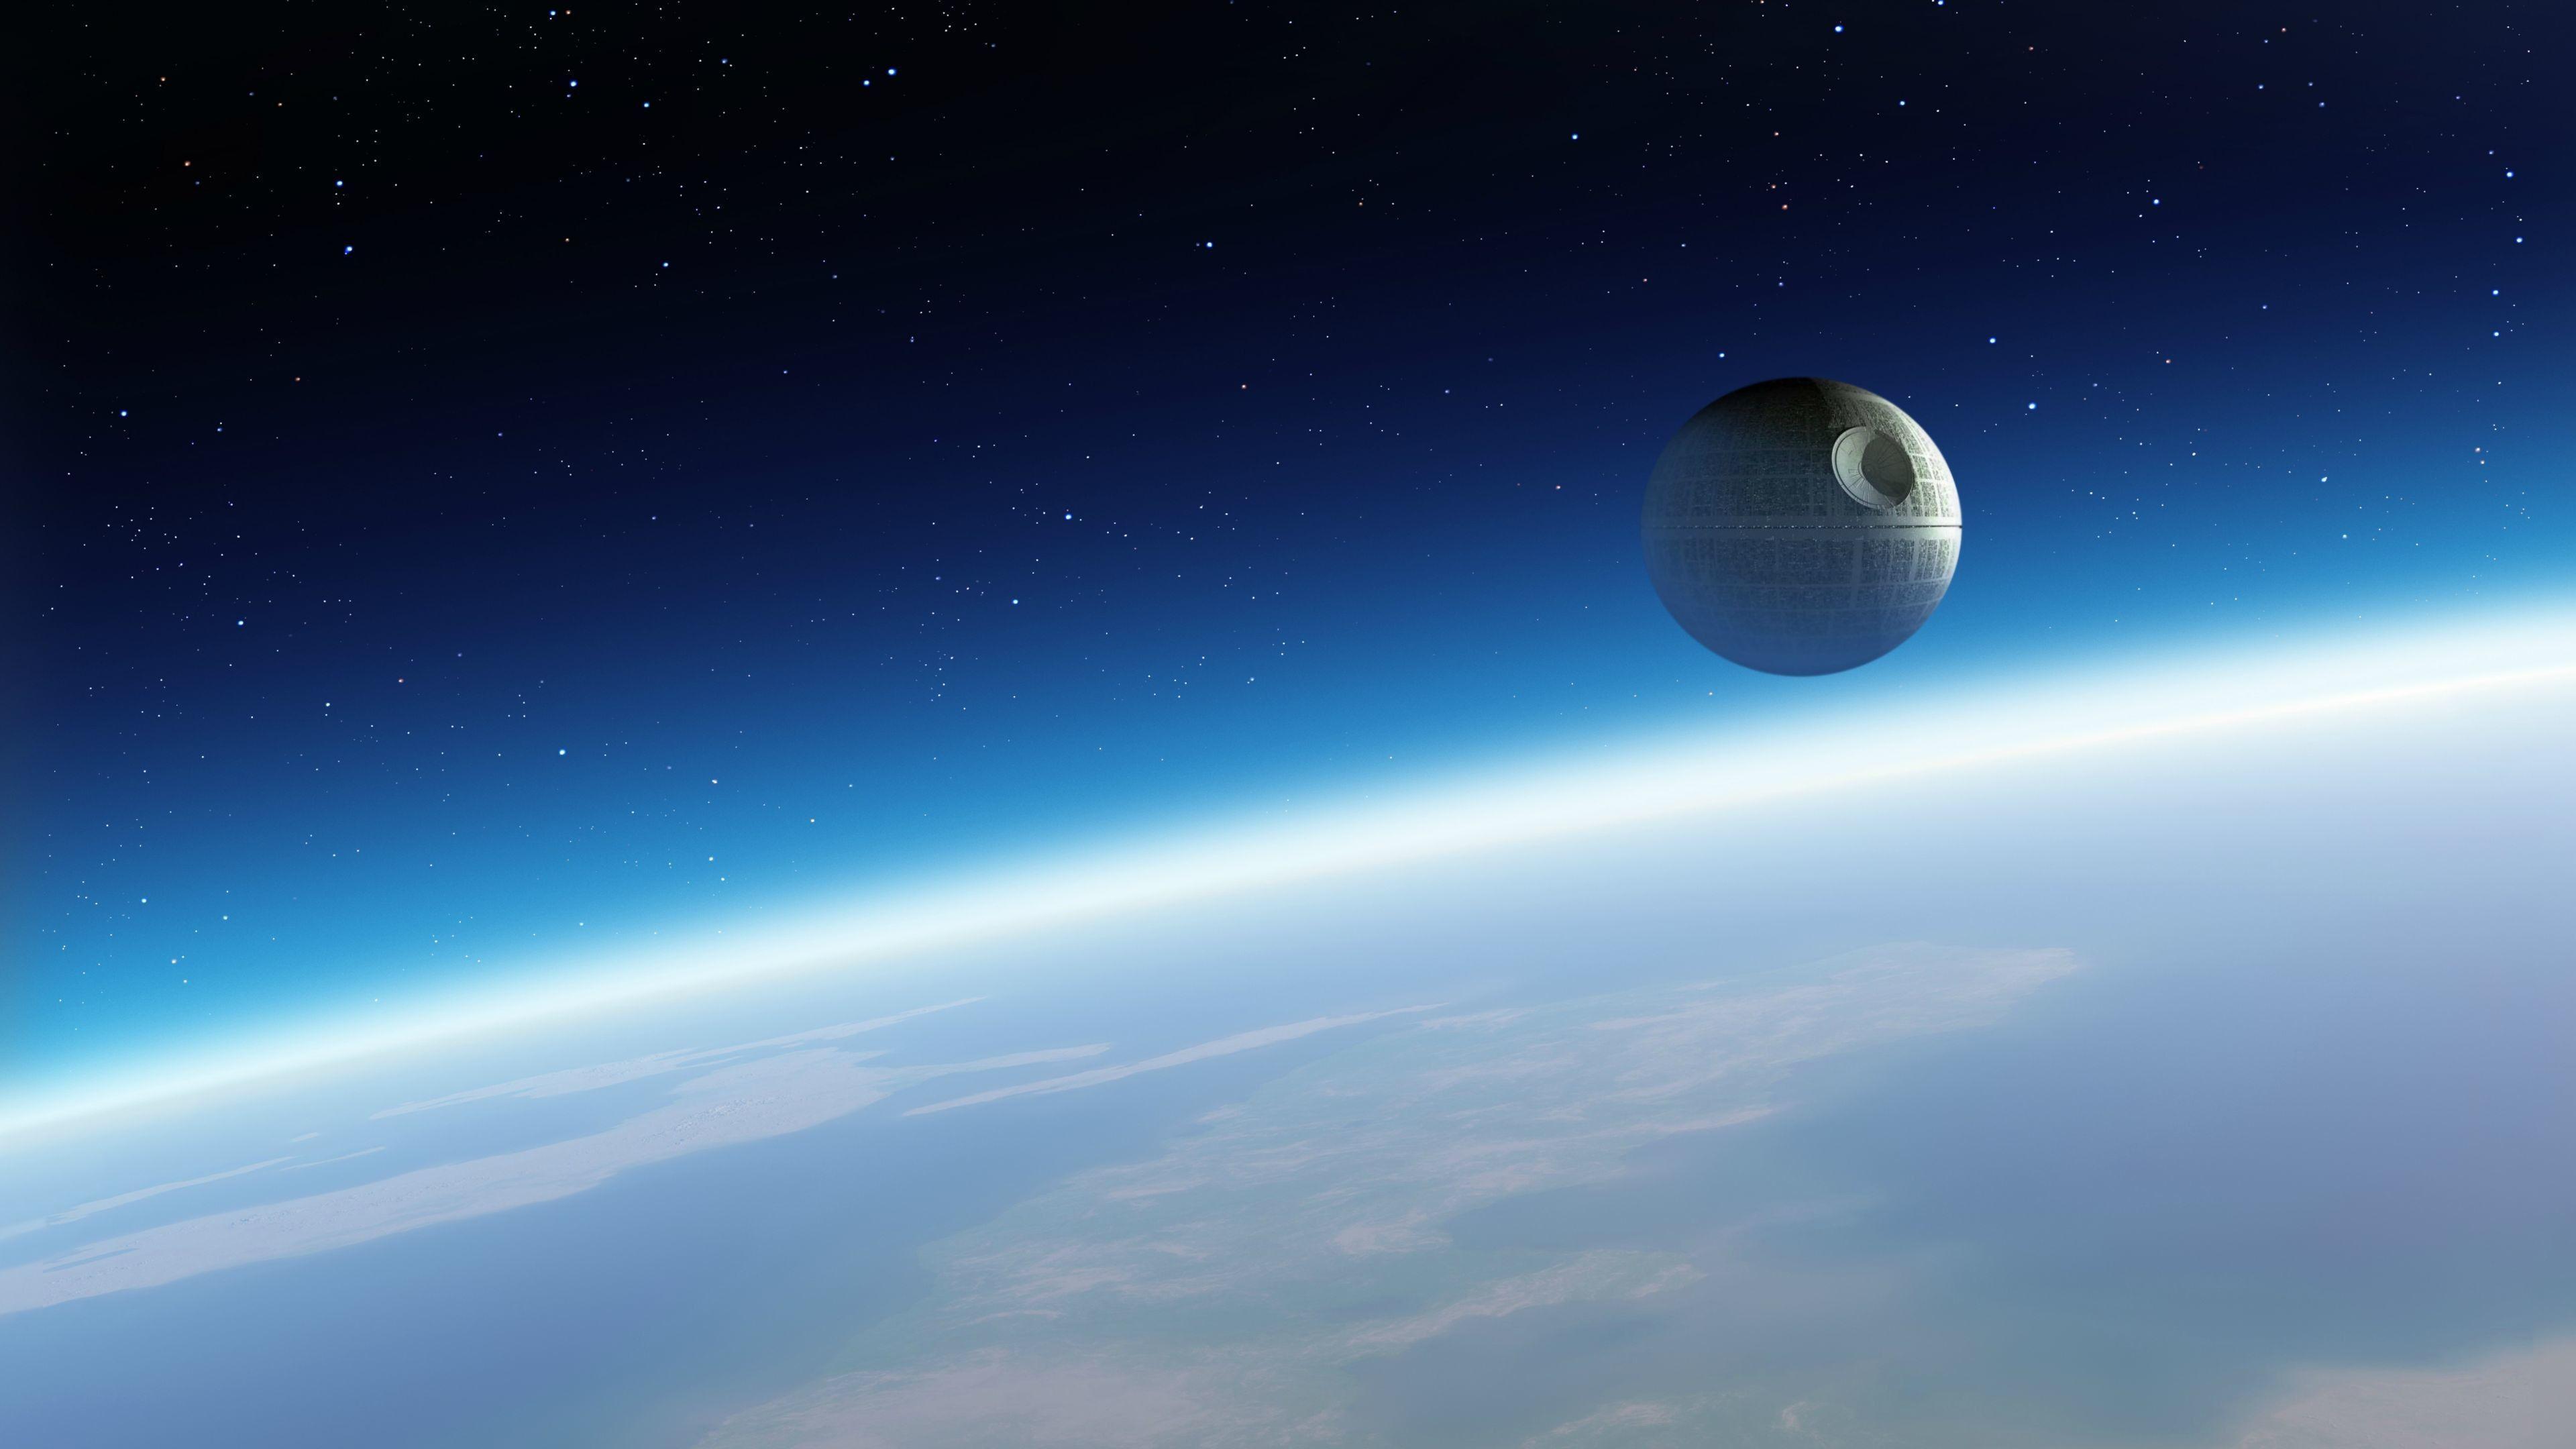 Death Star 4K Wallpapers - Top Free Death Star 4K ...